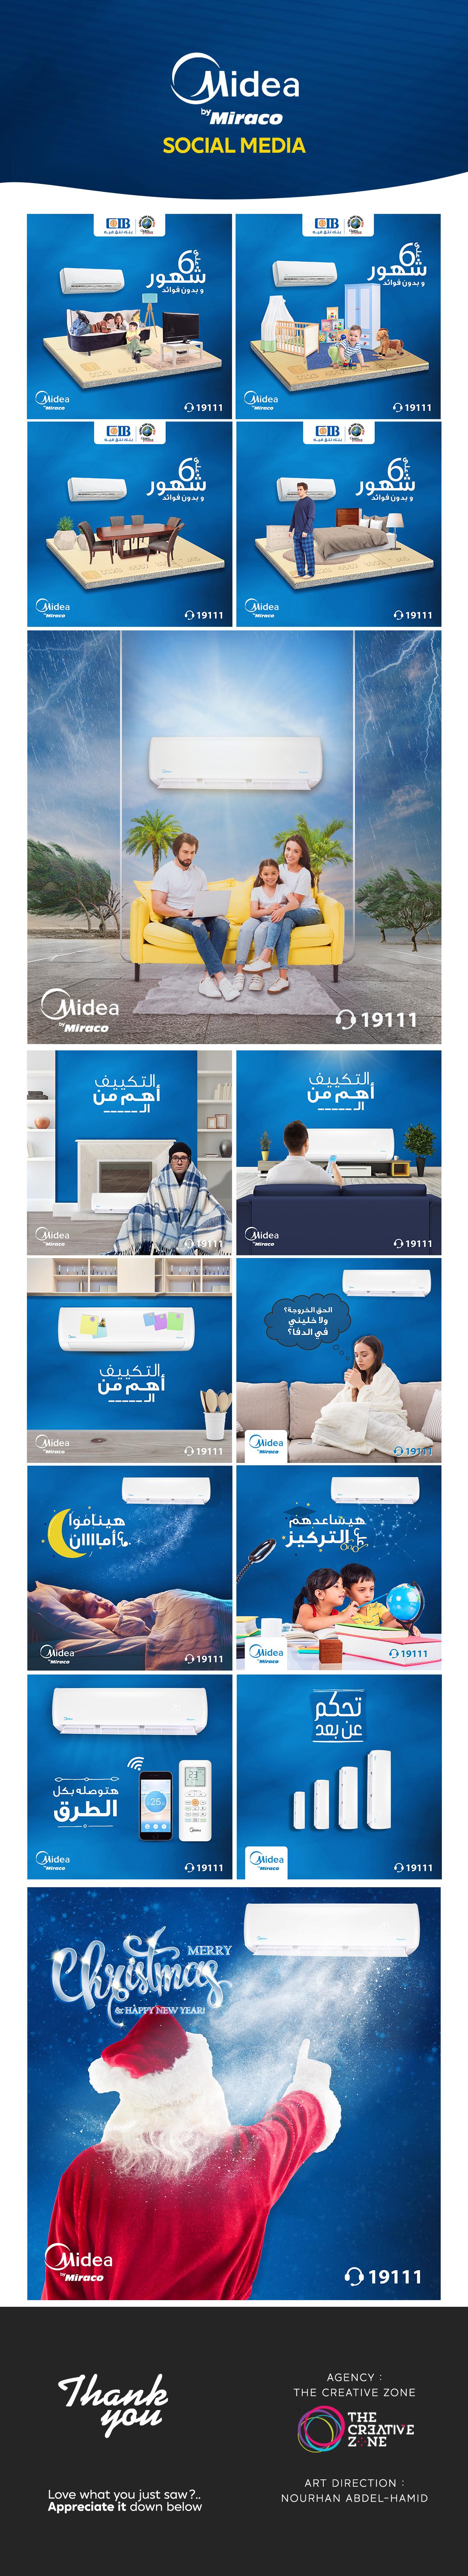 airconditioner Socialmedia Midea campaigns Bank cib installments ArtDirection socialmedia design miraco